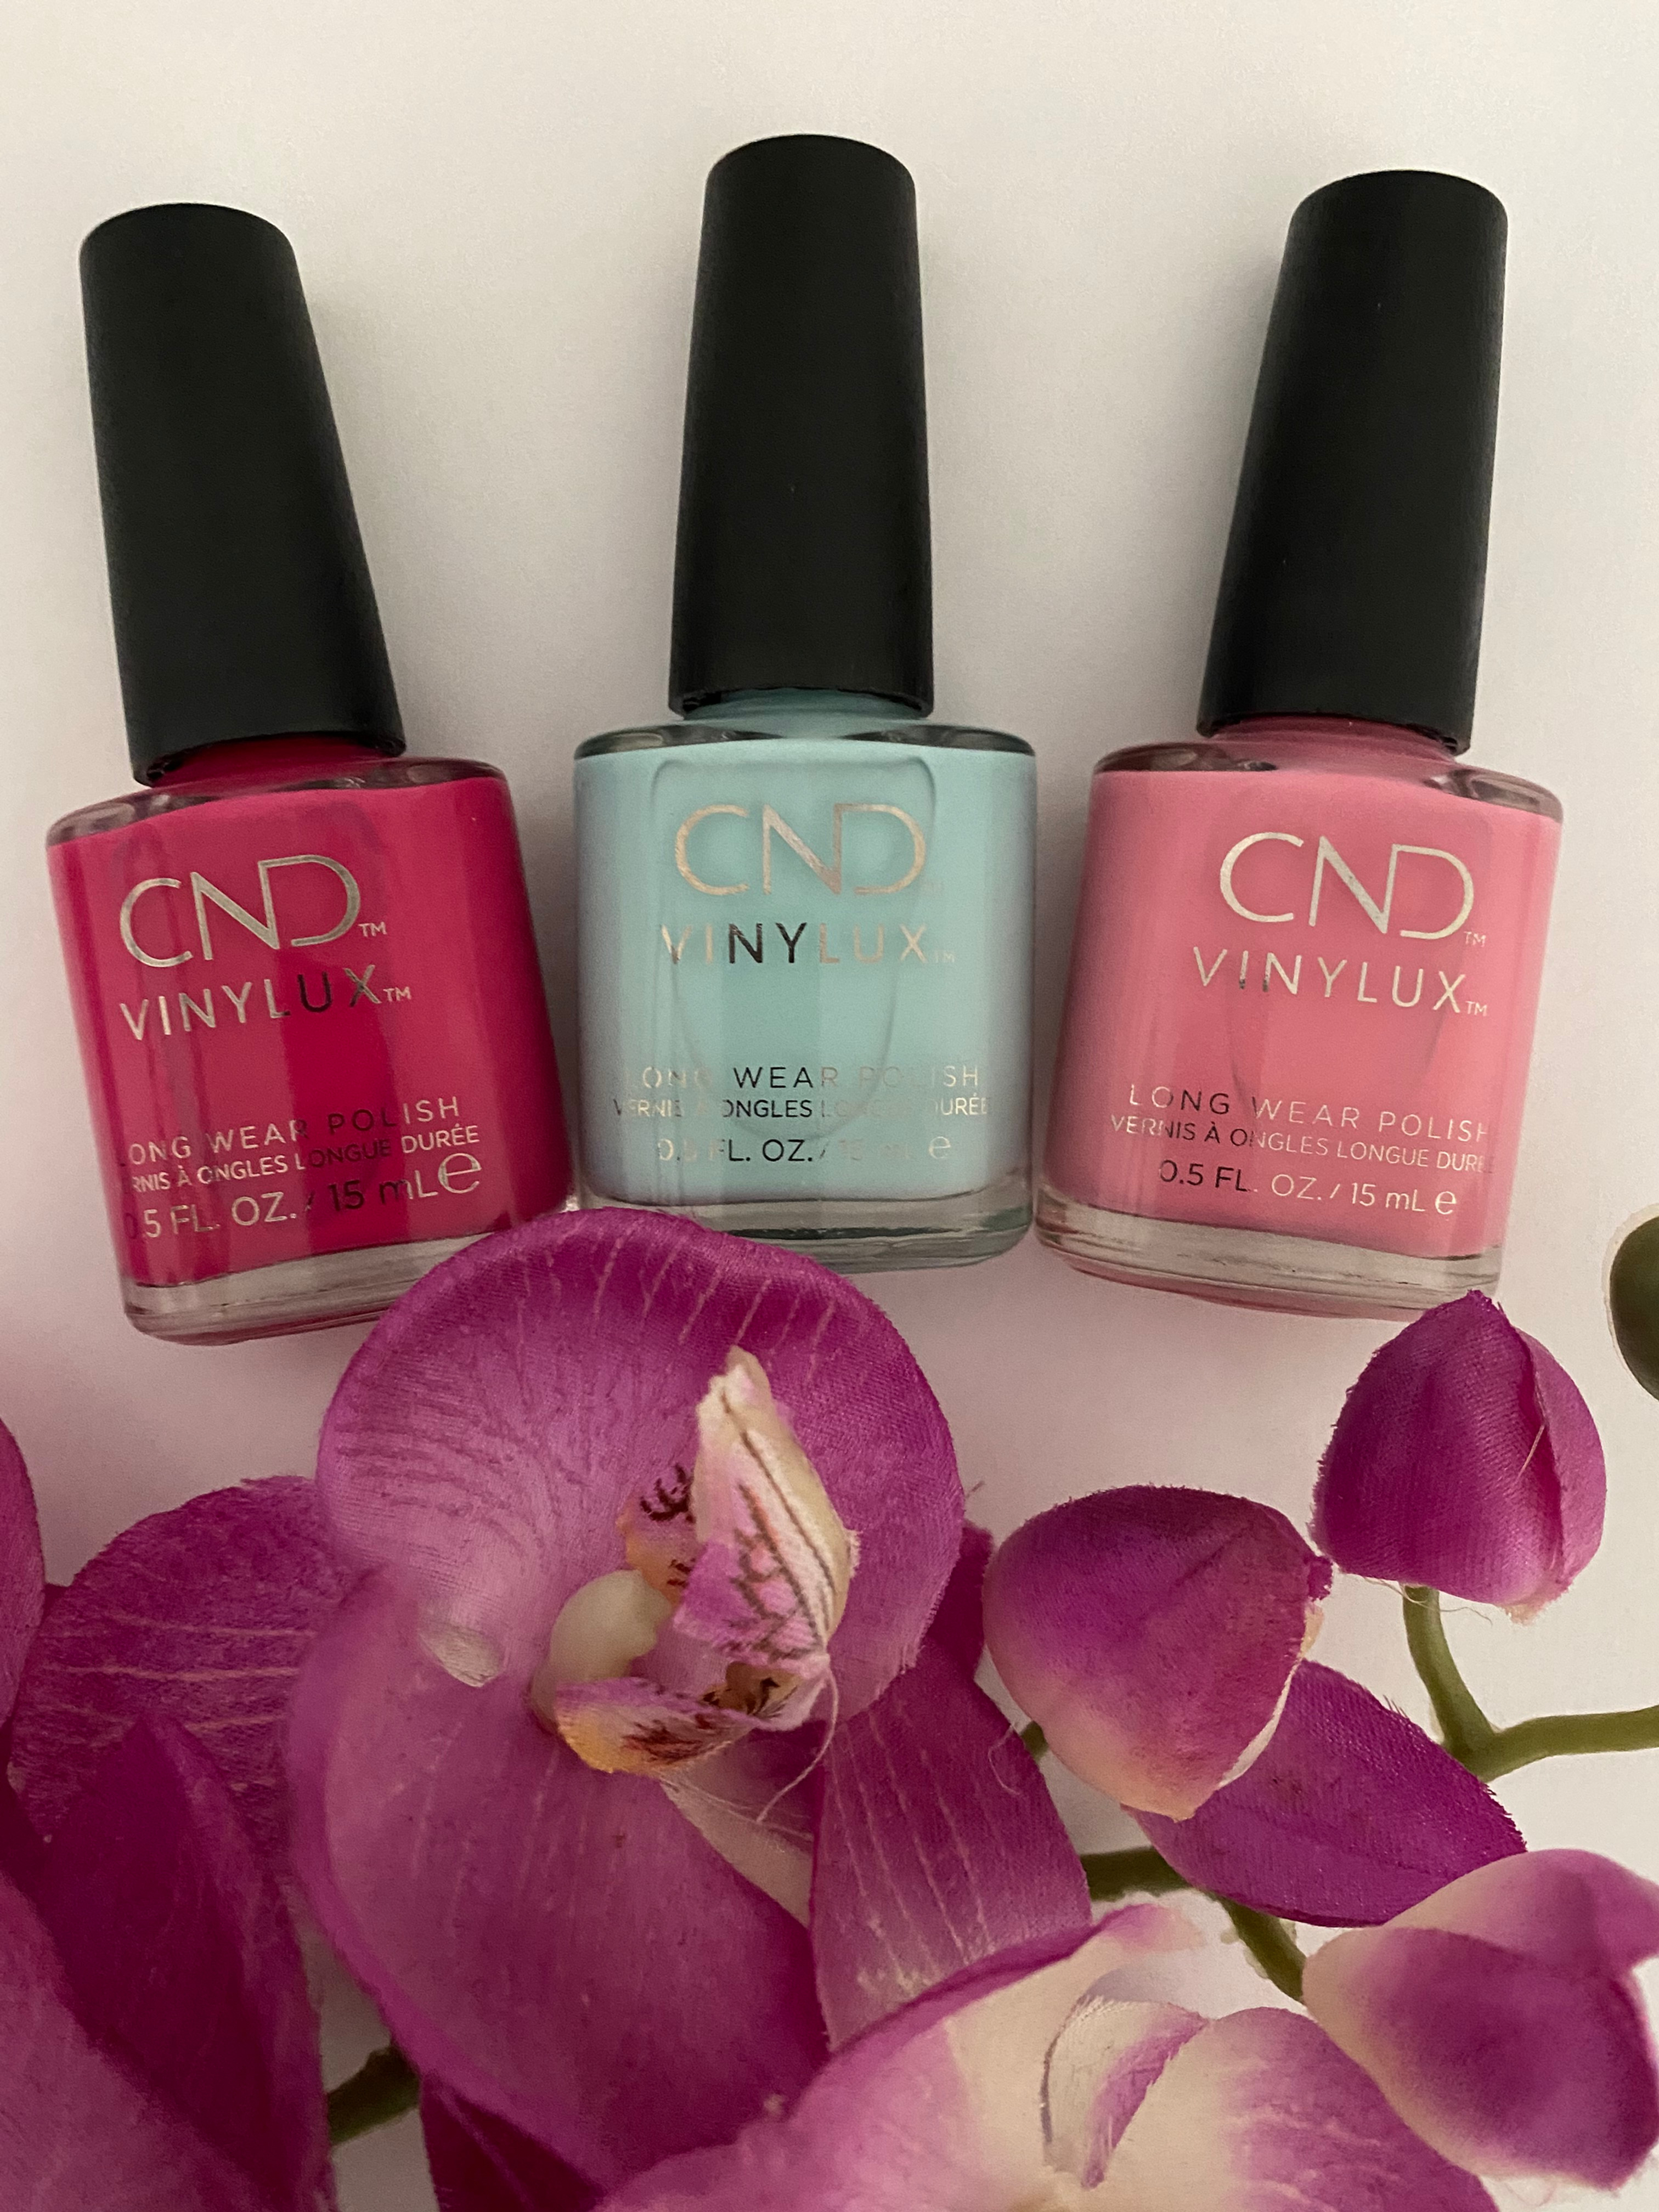 CND Vinylux 7 day wear Nail Polish